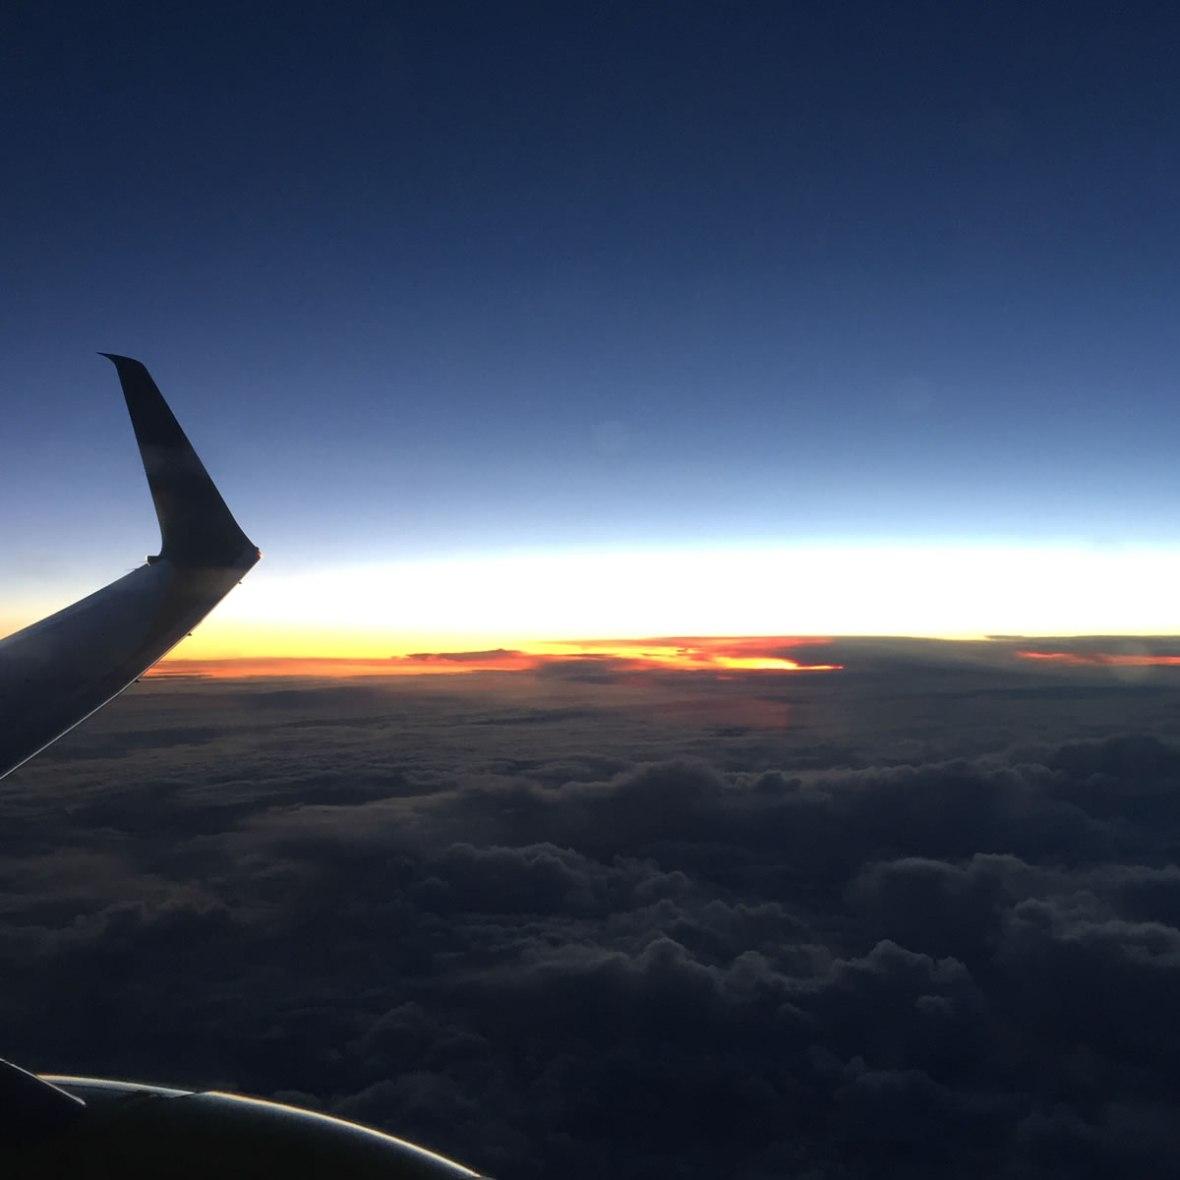 sky-line